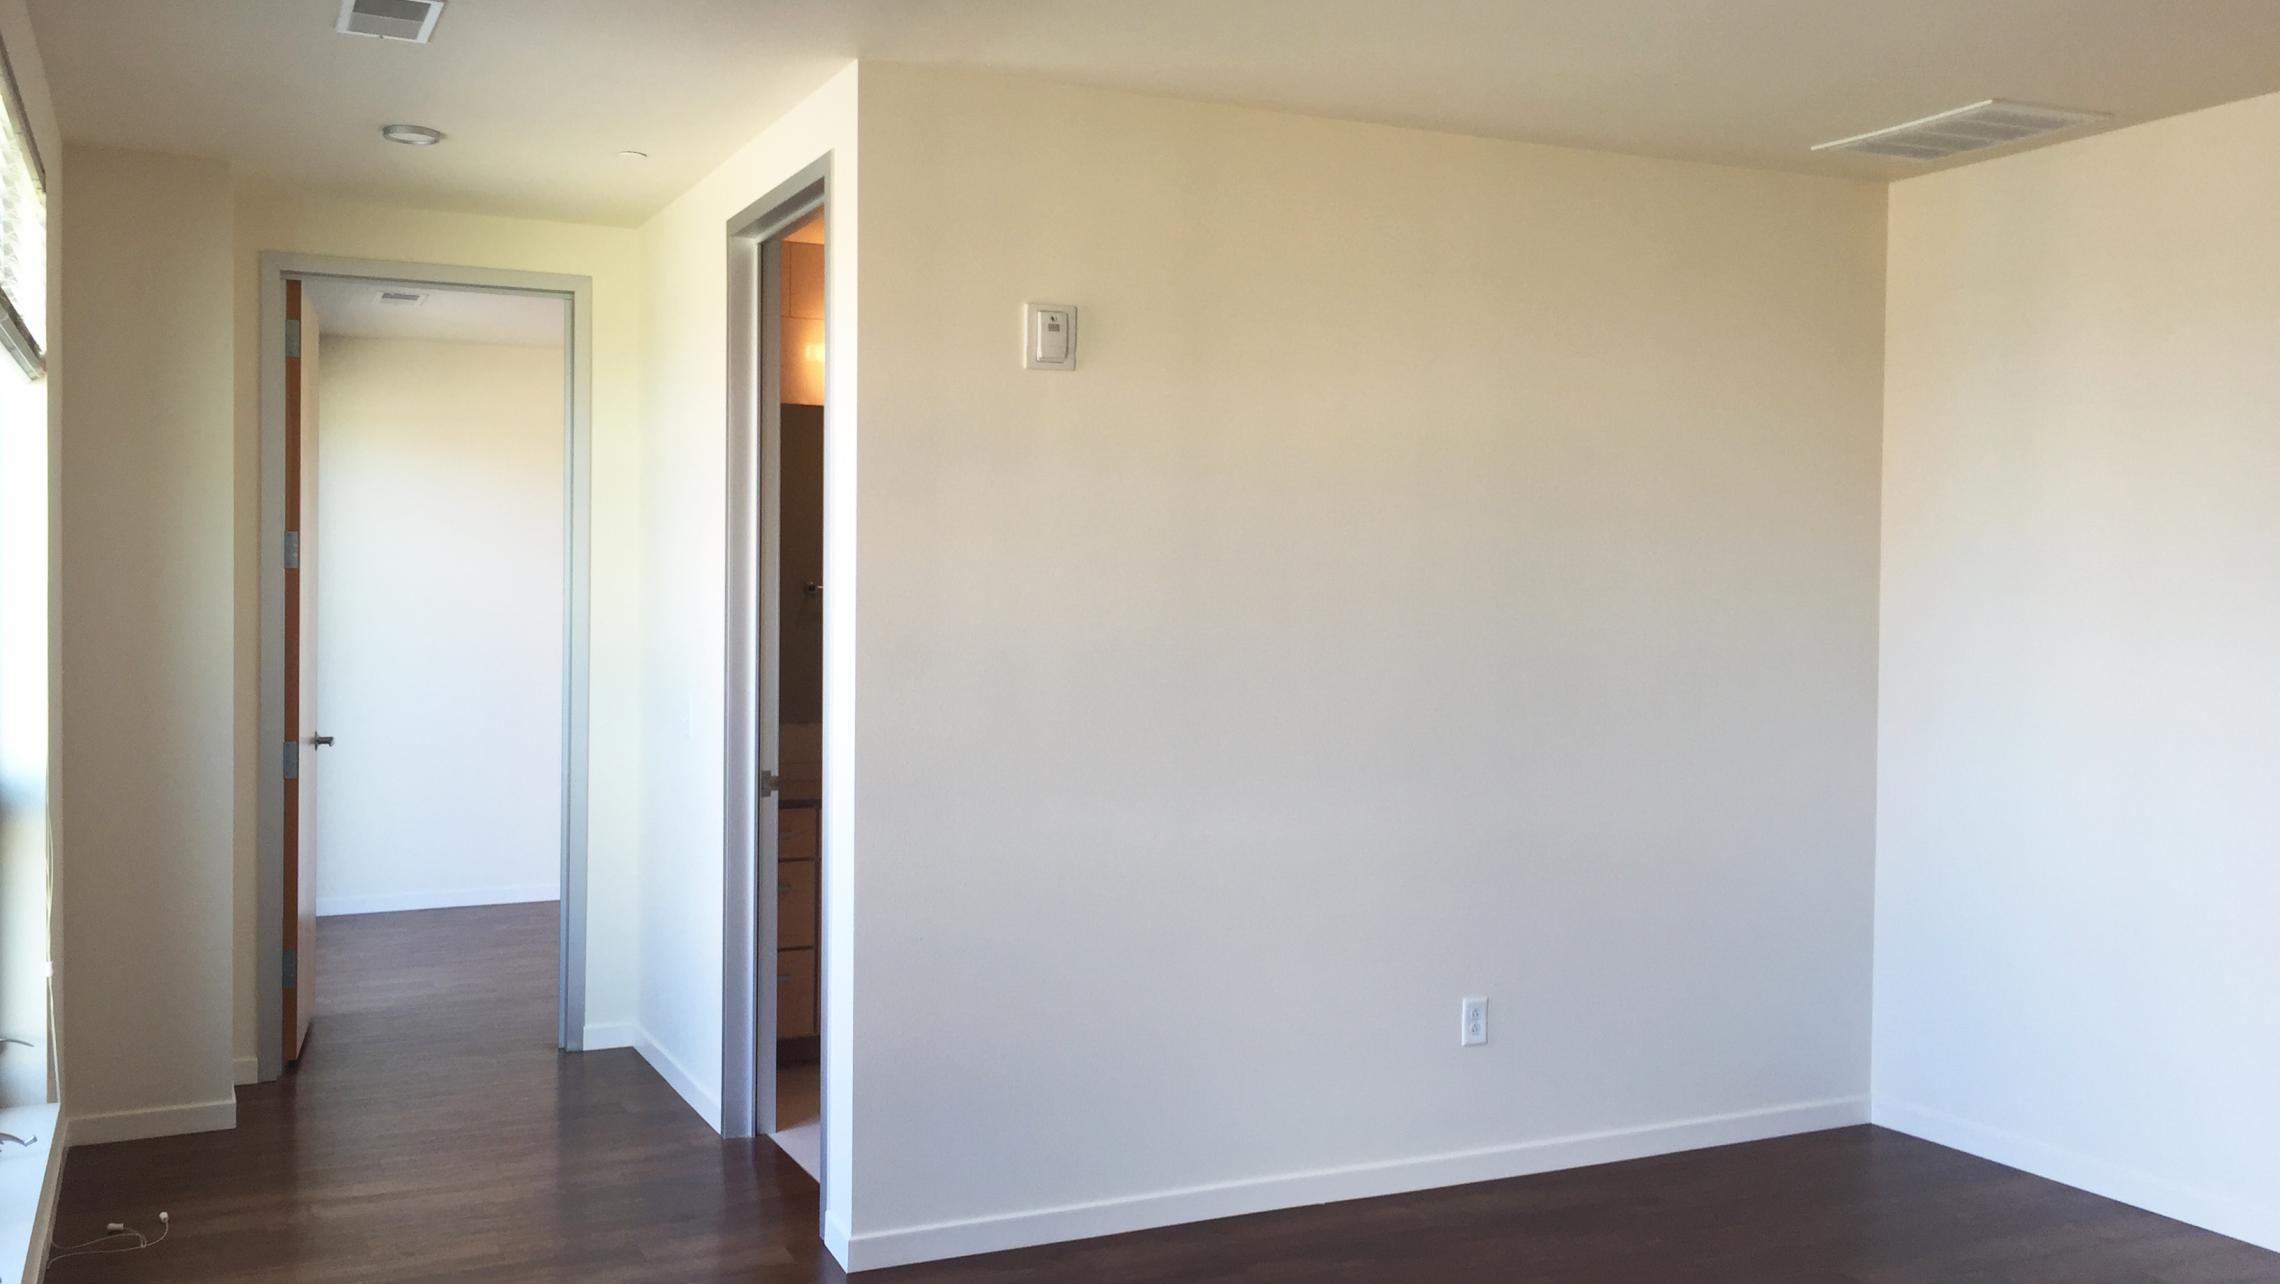 ULI Nine Line Apartment 212 - Living Room